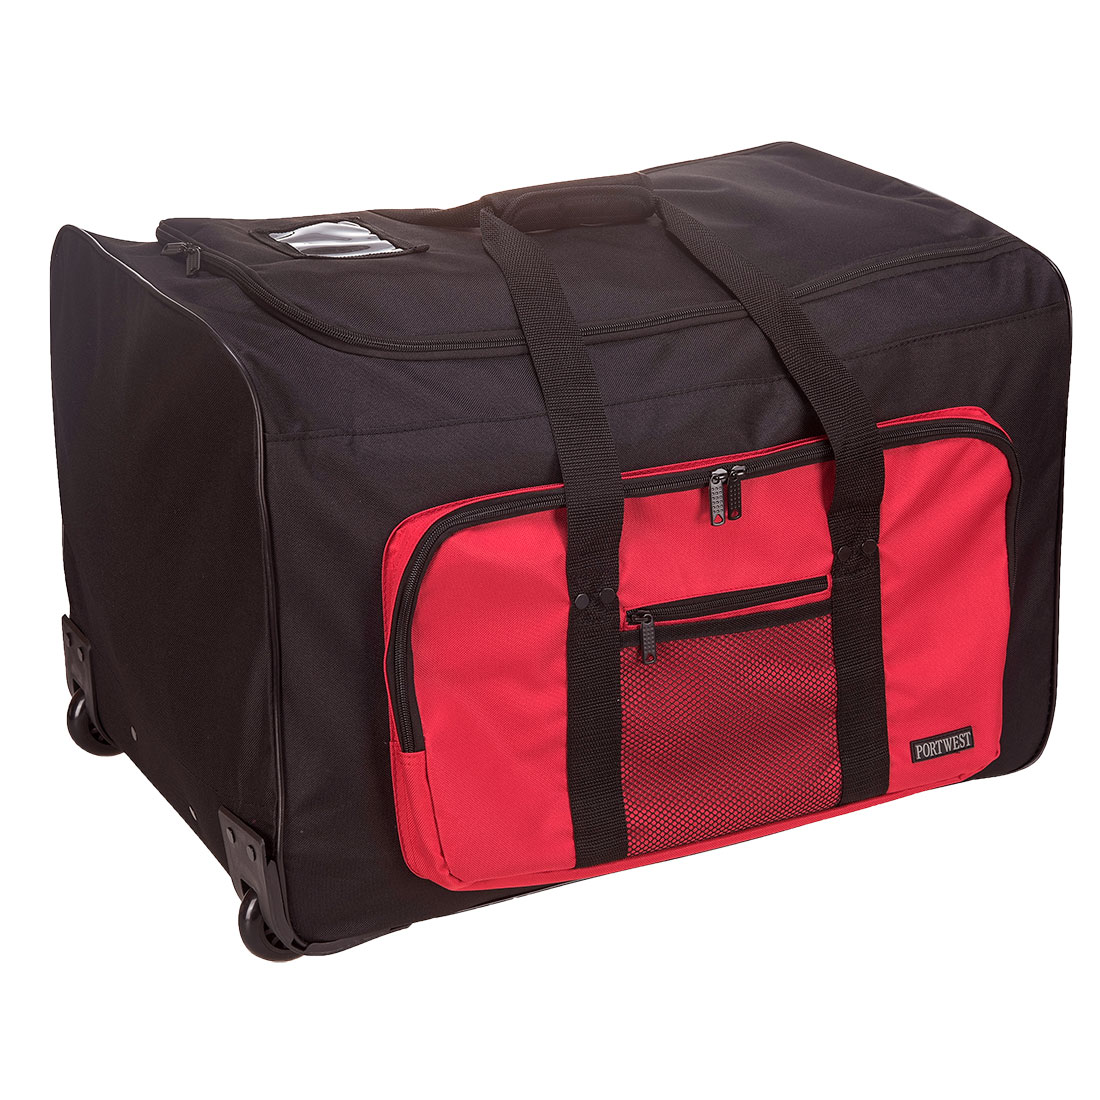 Portwest The Multi-Pocket Trolley Bag